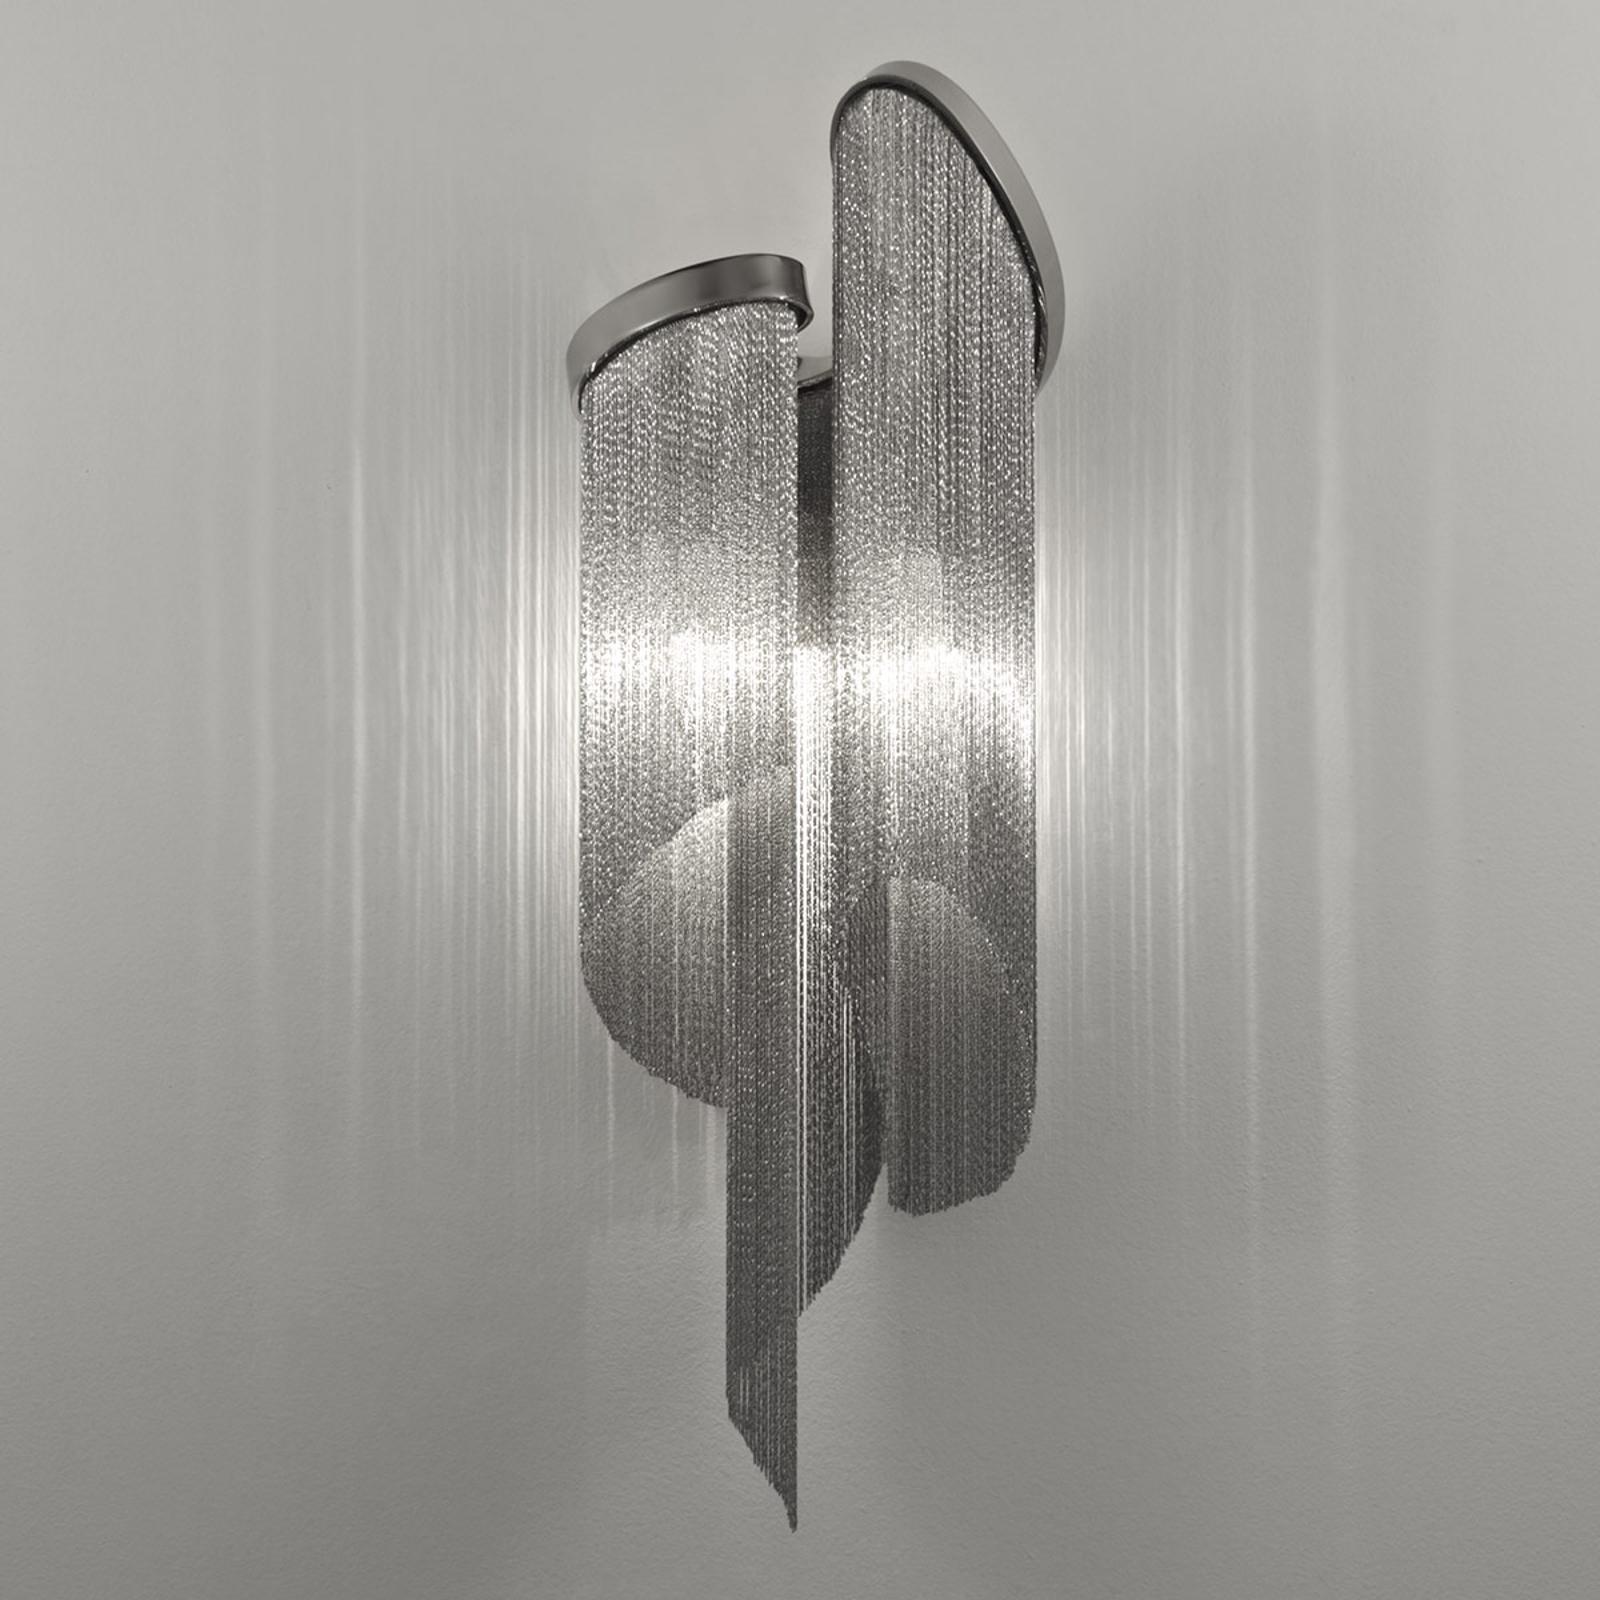 Wandlamp Stream met levendige lichtwerking